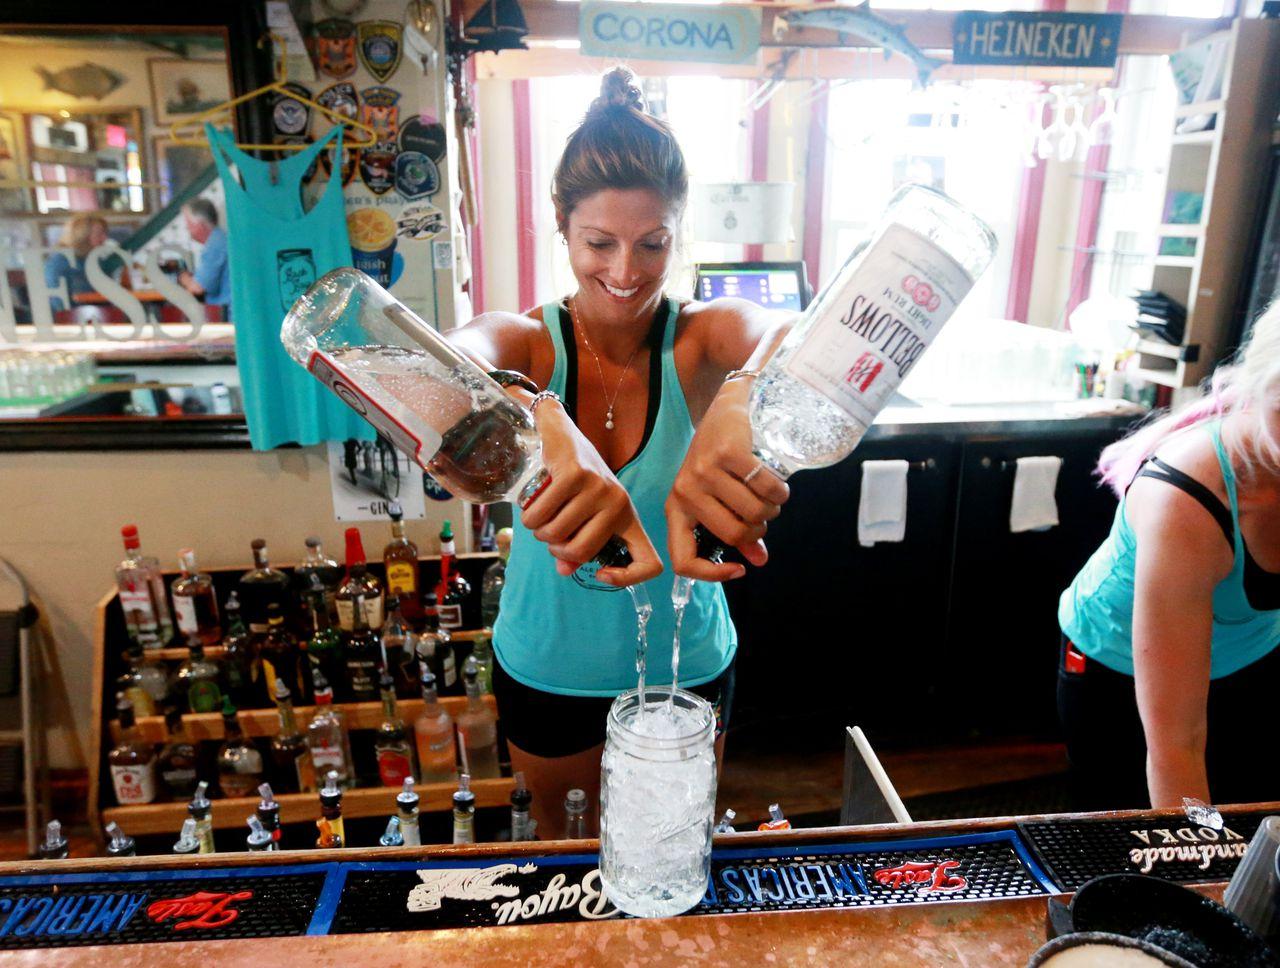 Drinking Will Soon Be Allowed On Atlantic City Boardwalk During Coronavirus Closures photo